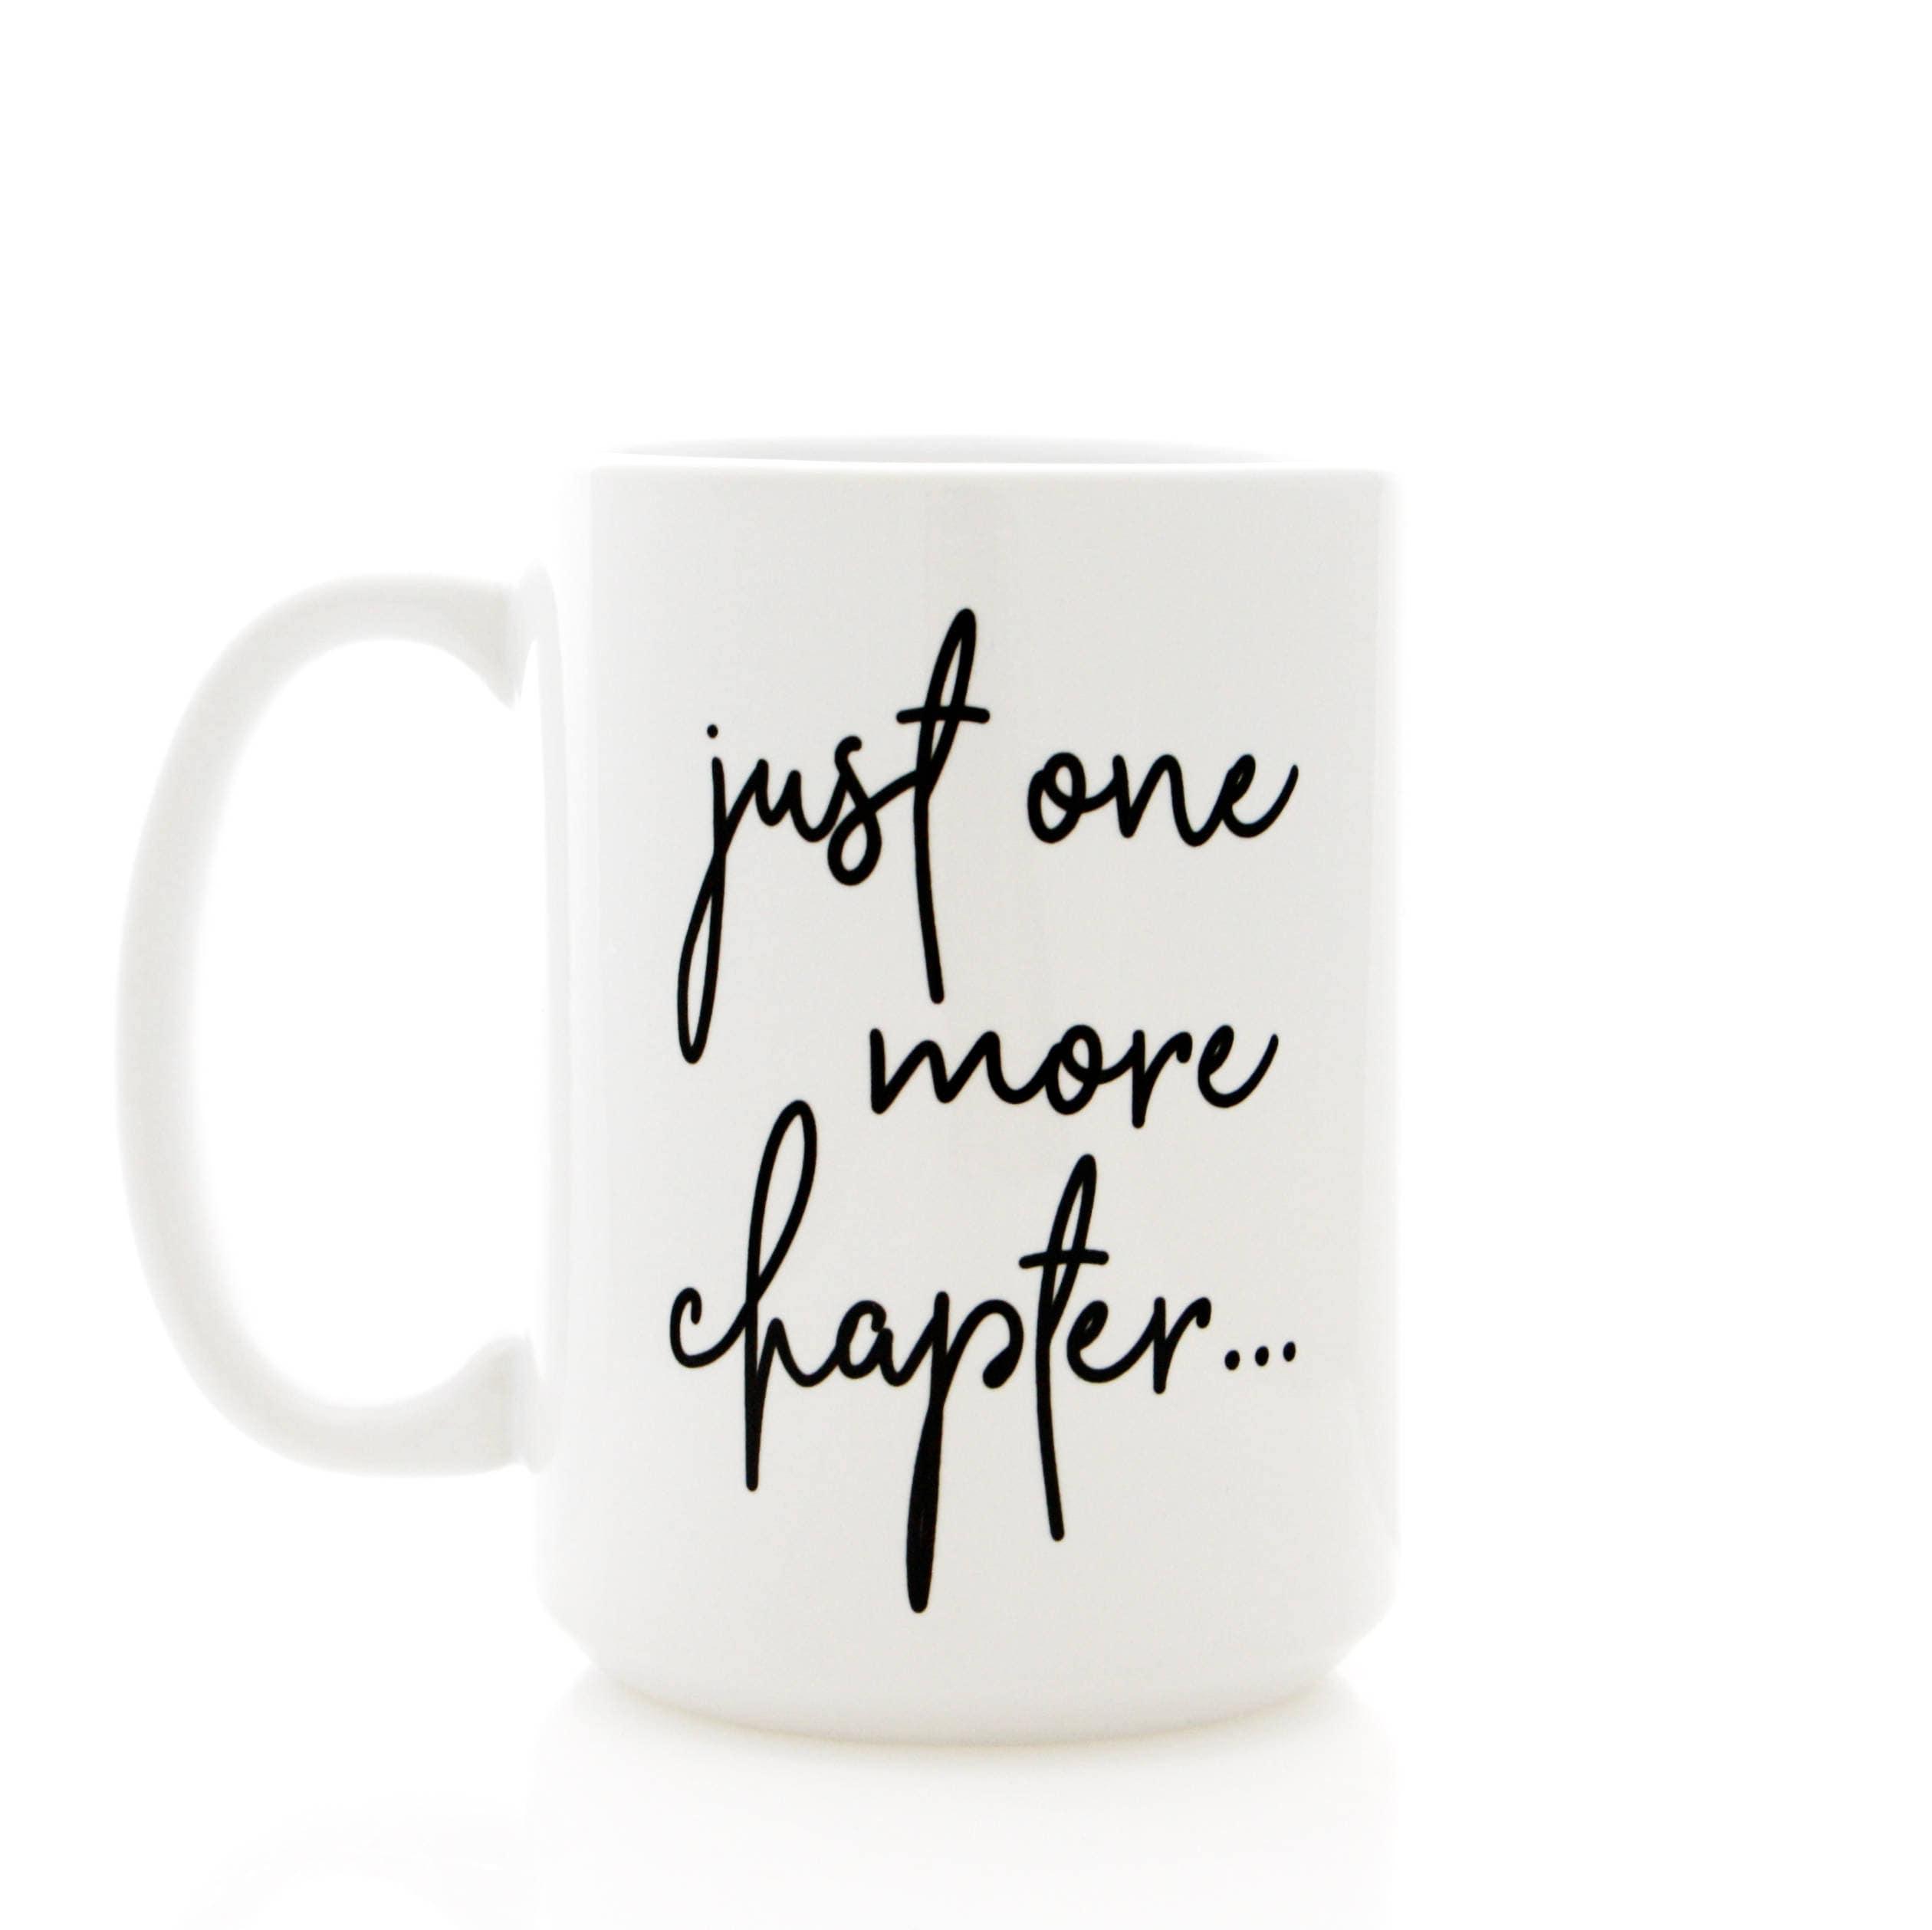 Bookworm Gifts Hot Tea Warm Blankets and Good Books Reading Coffee Mug Tea Cup